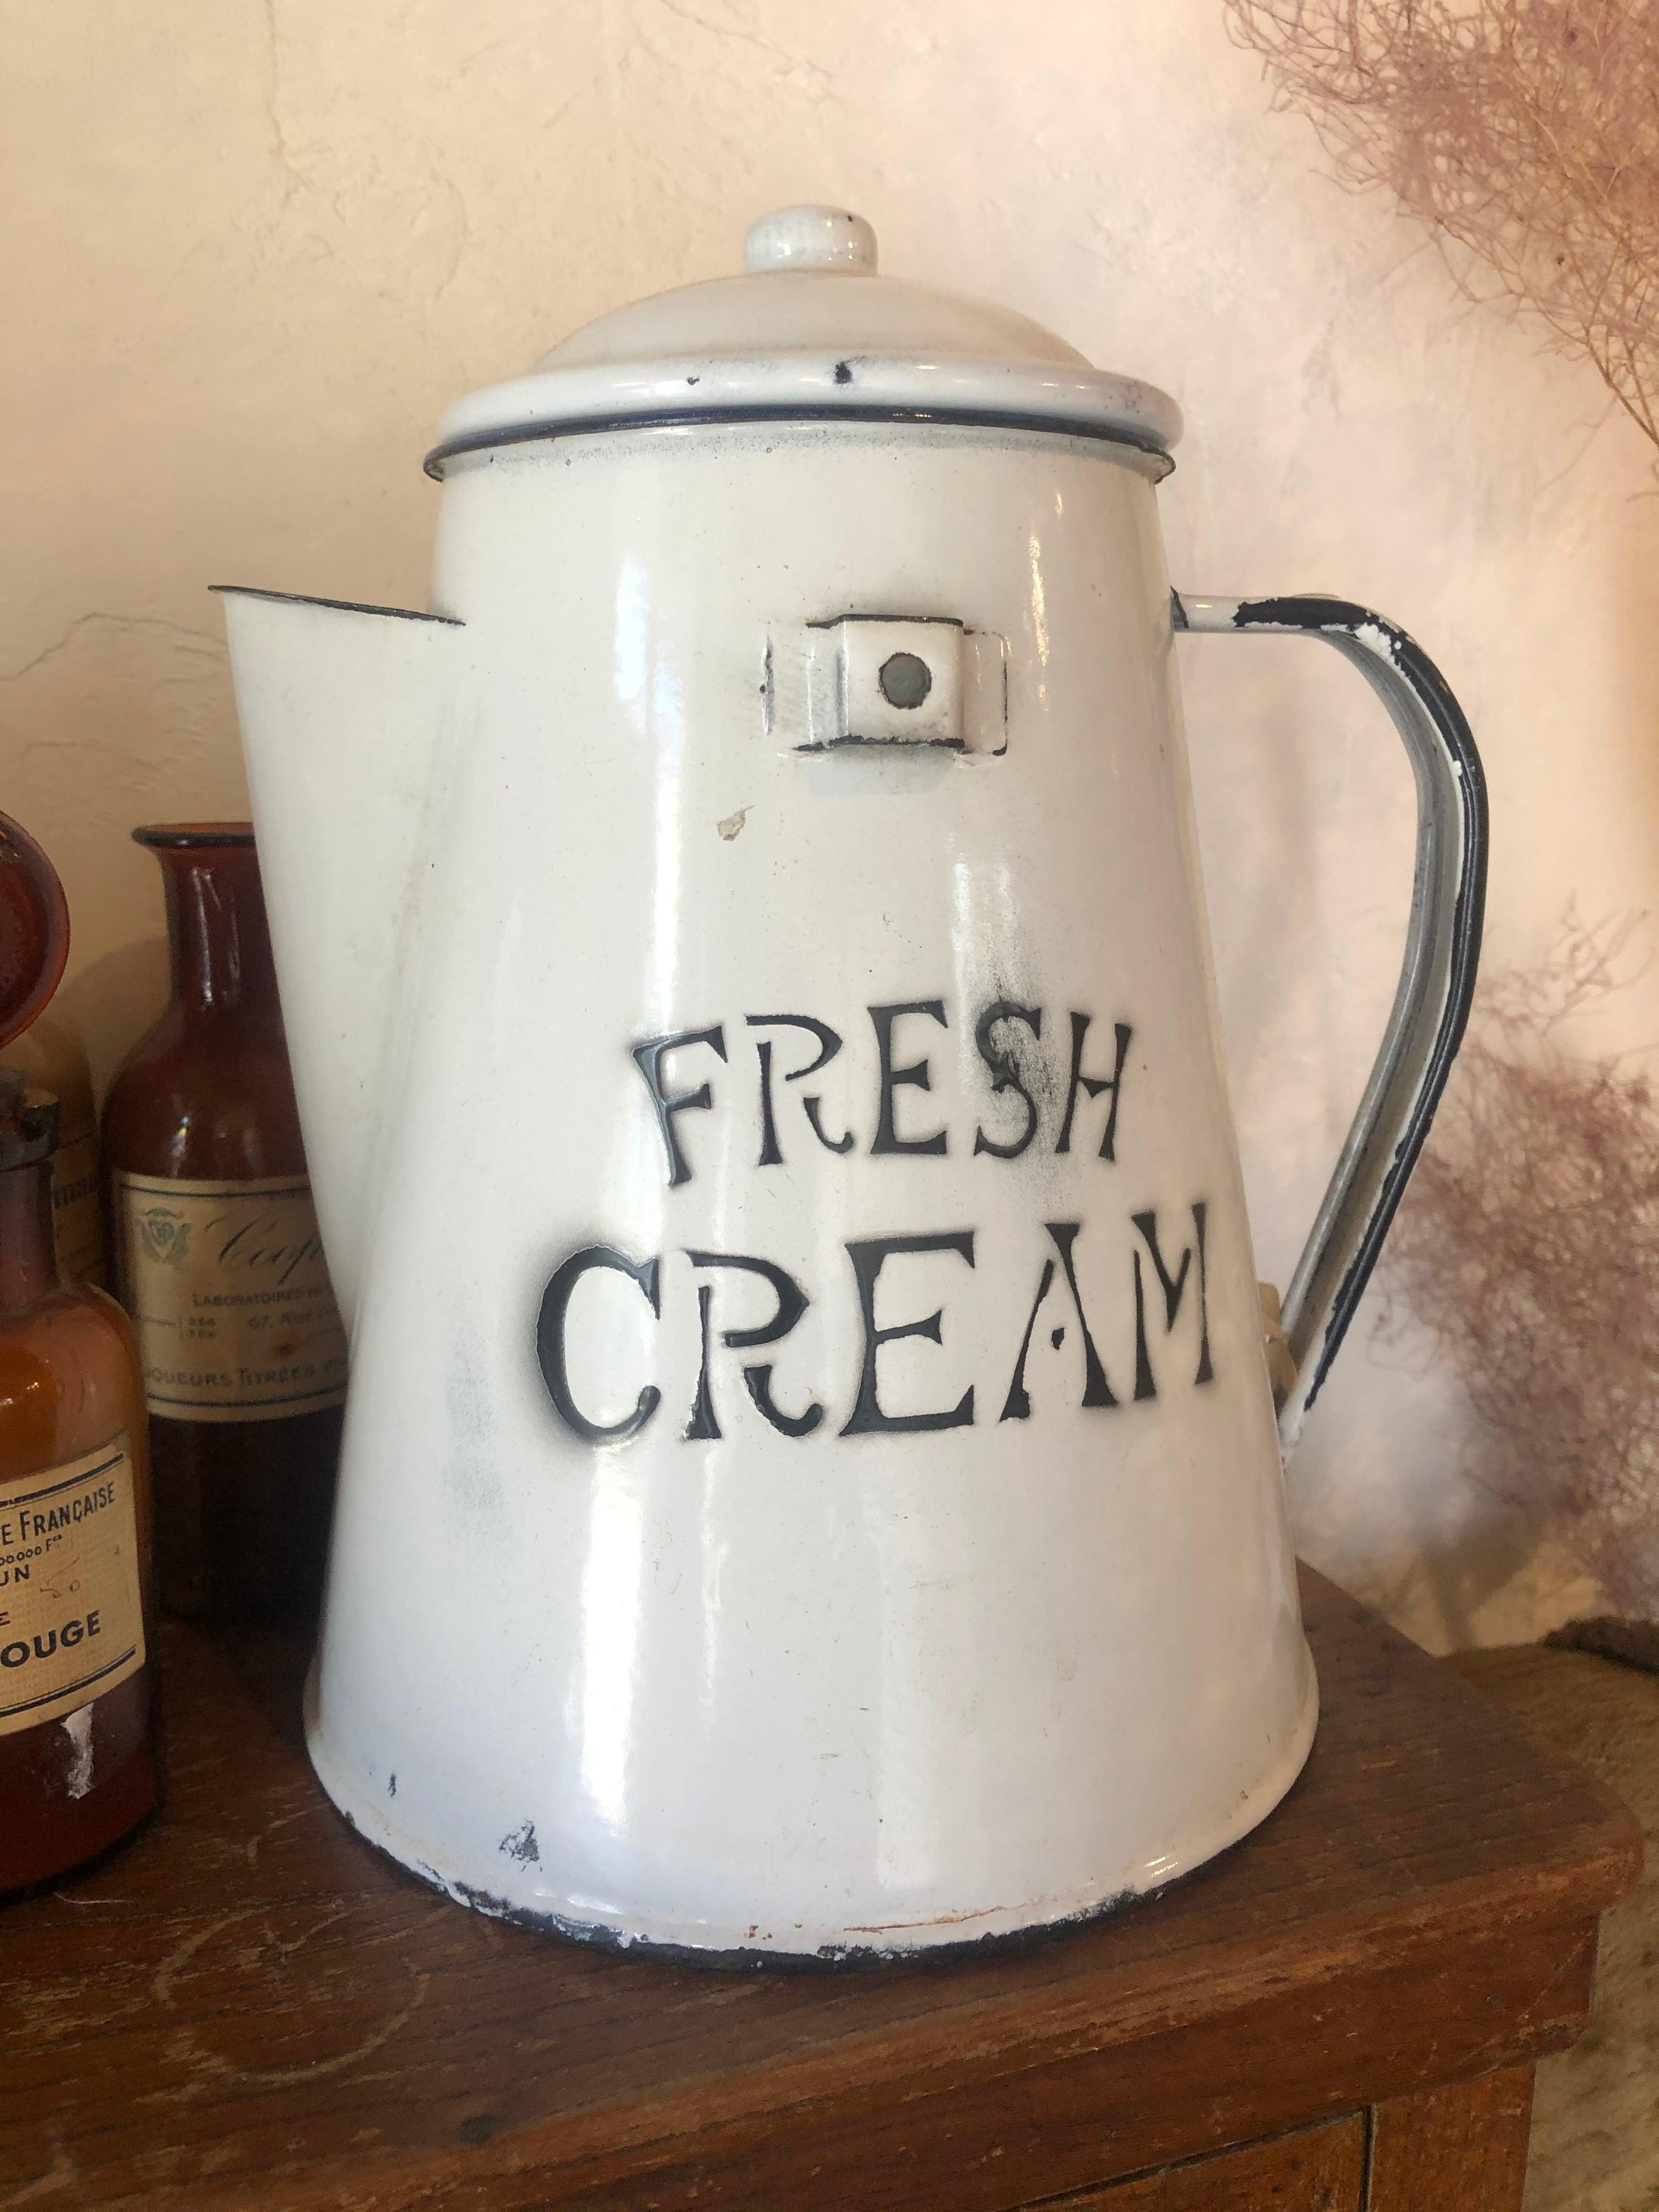 FRESH CREAM ホーローコーヒーポット Vintage Enamel Fresh Cream Pot